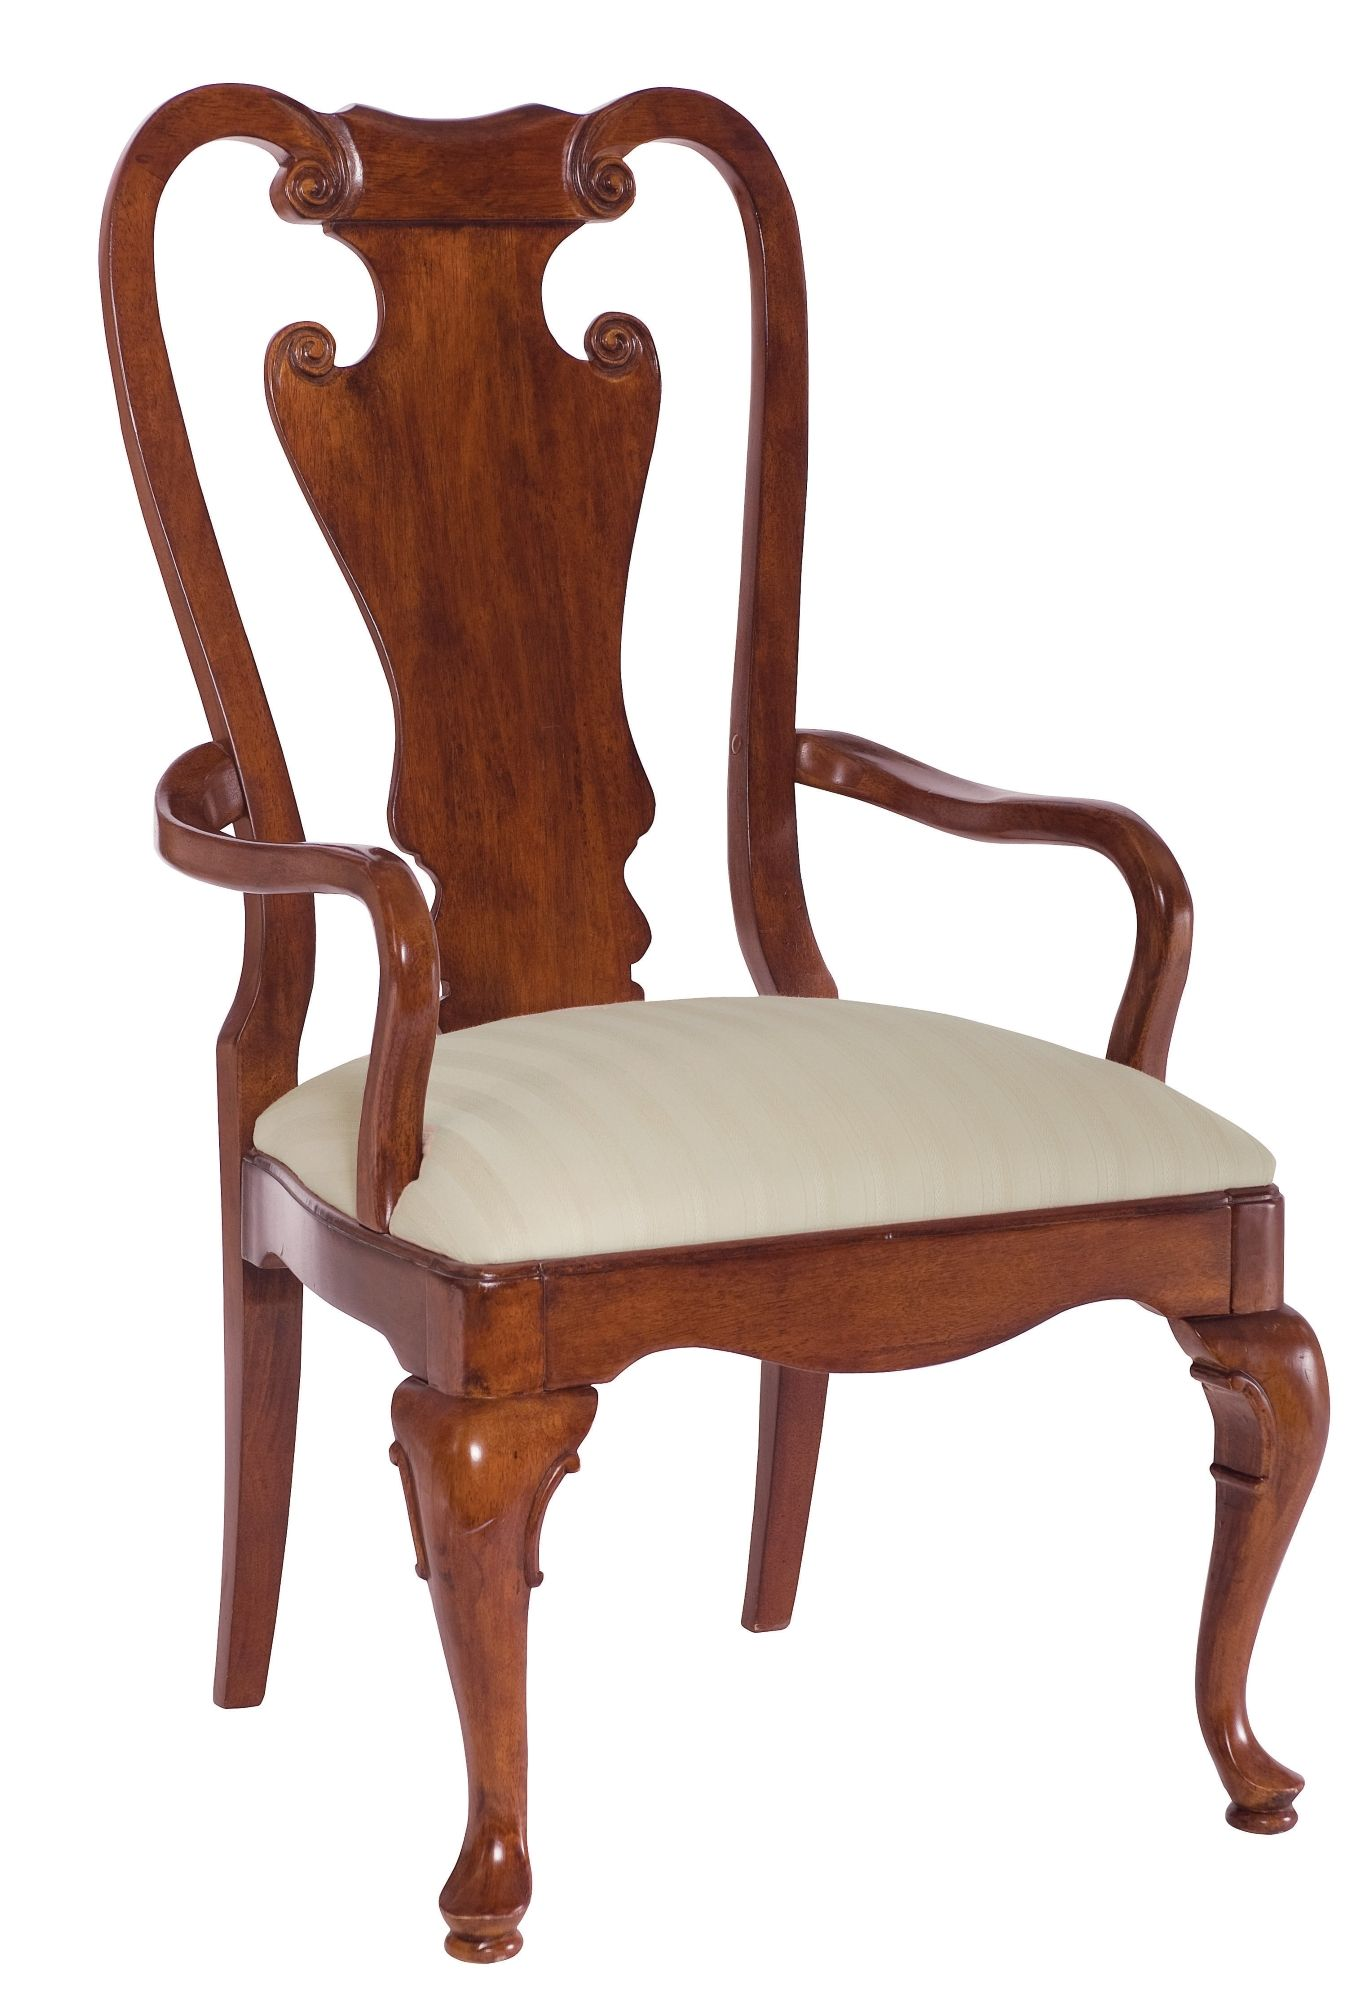 American Drew Cherry Grove Splat Back Arm Chair Chair Lexington Furniture Furniture